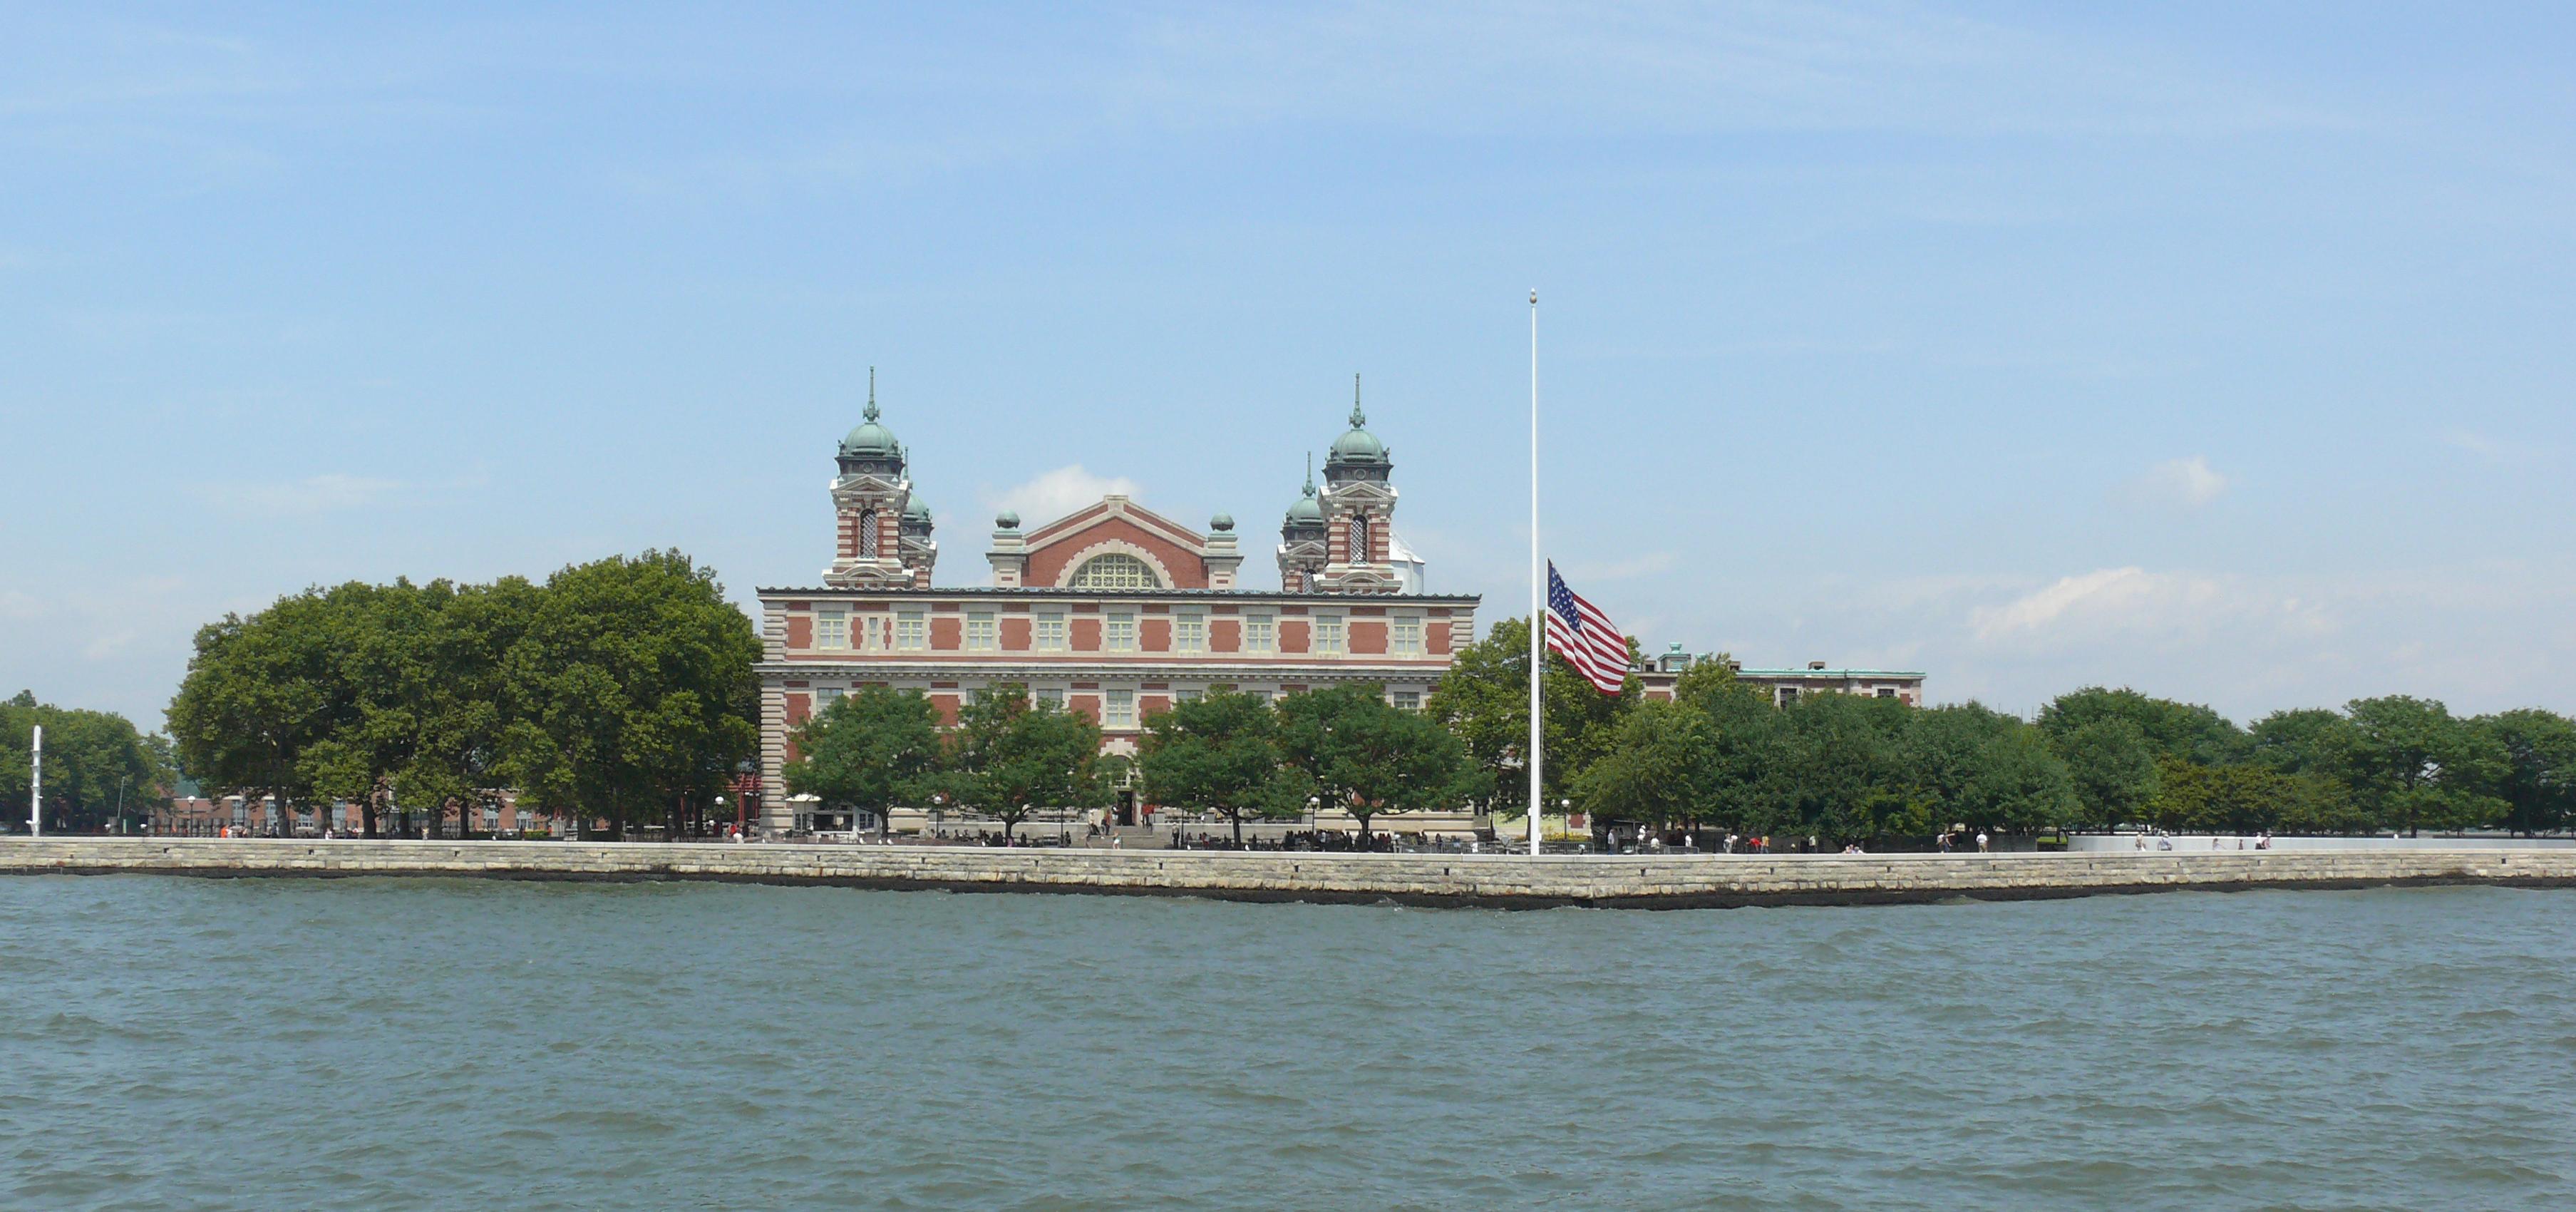 Ellis Island Citation